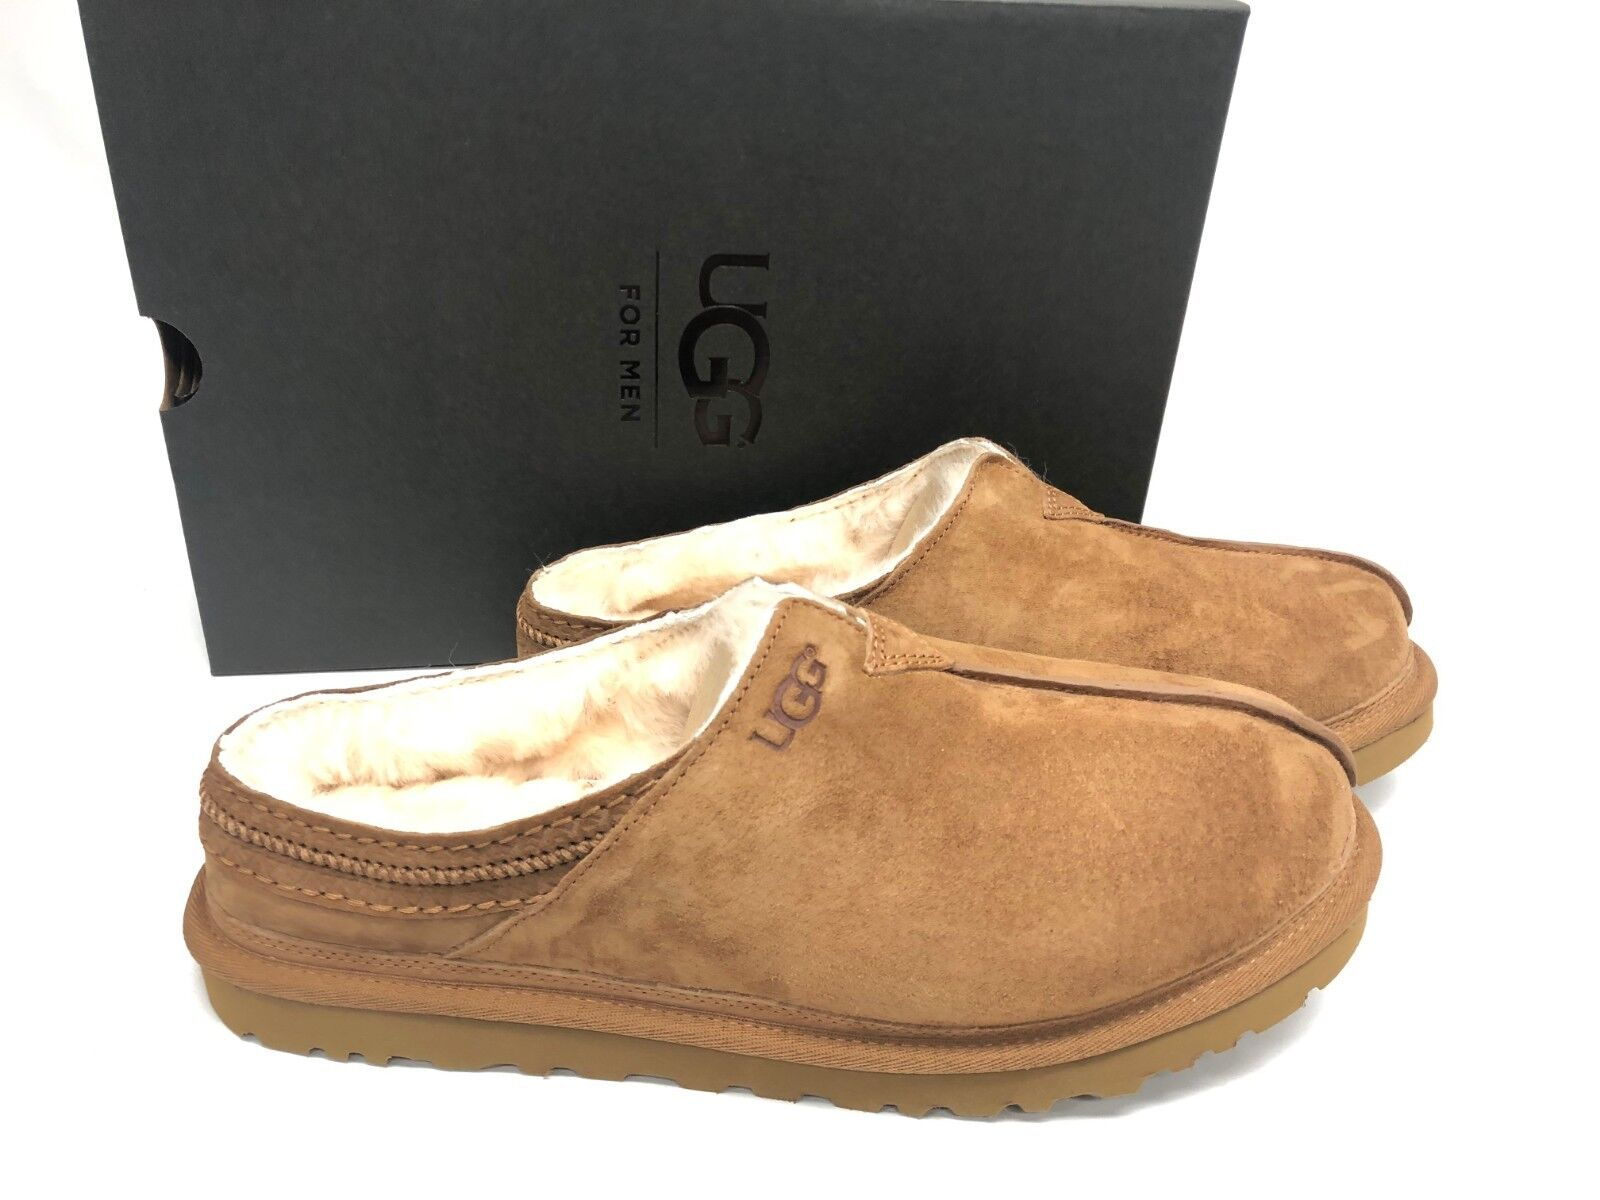 9c281441b7e UGG Australia Men's Neuman Chestnut Suede Slippers Moccasin 3234 Size 7 -  17 10